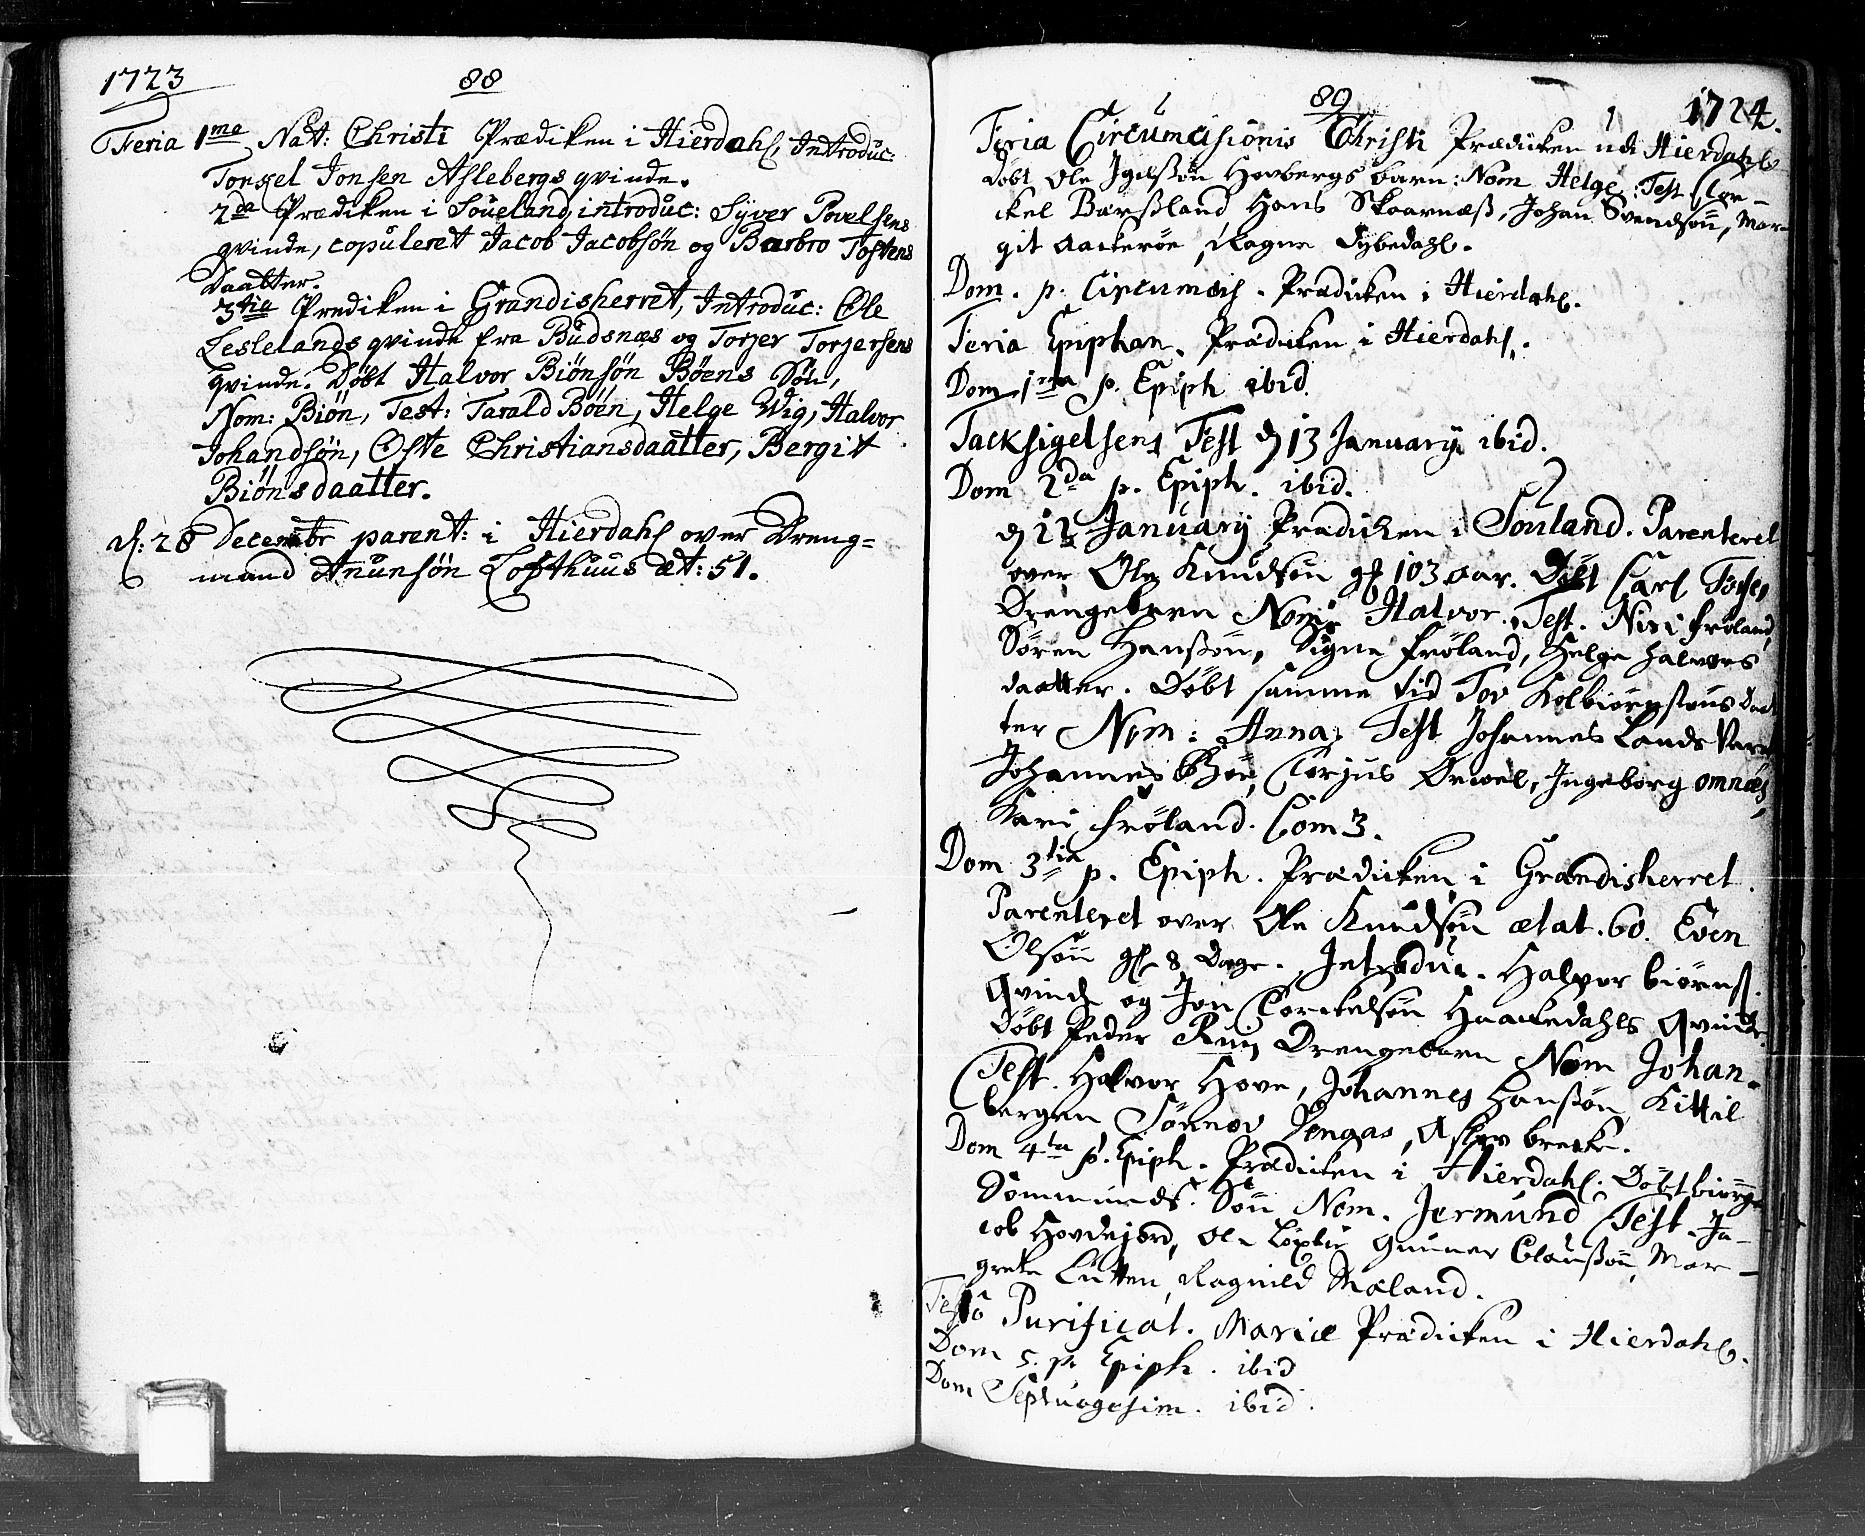 SAKO, Hjartdal kirkebøker, F/Fa/L0002: Ministerialbok nr. I 2, 1716-1754, s. 88-89